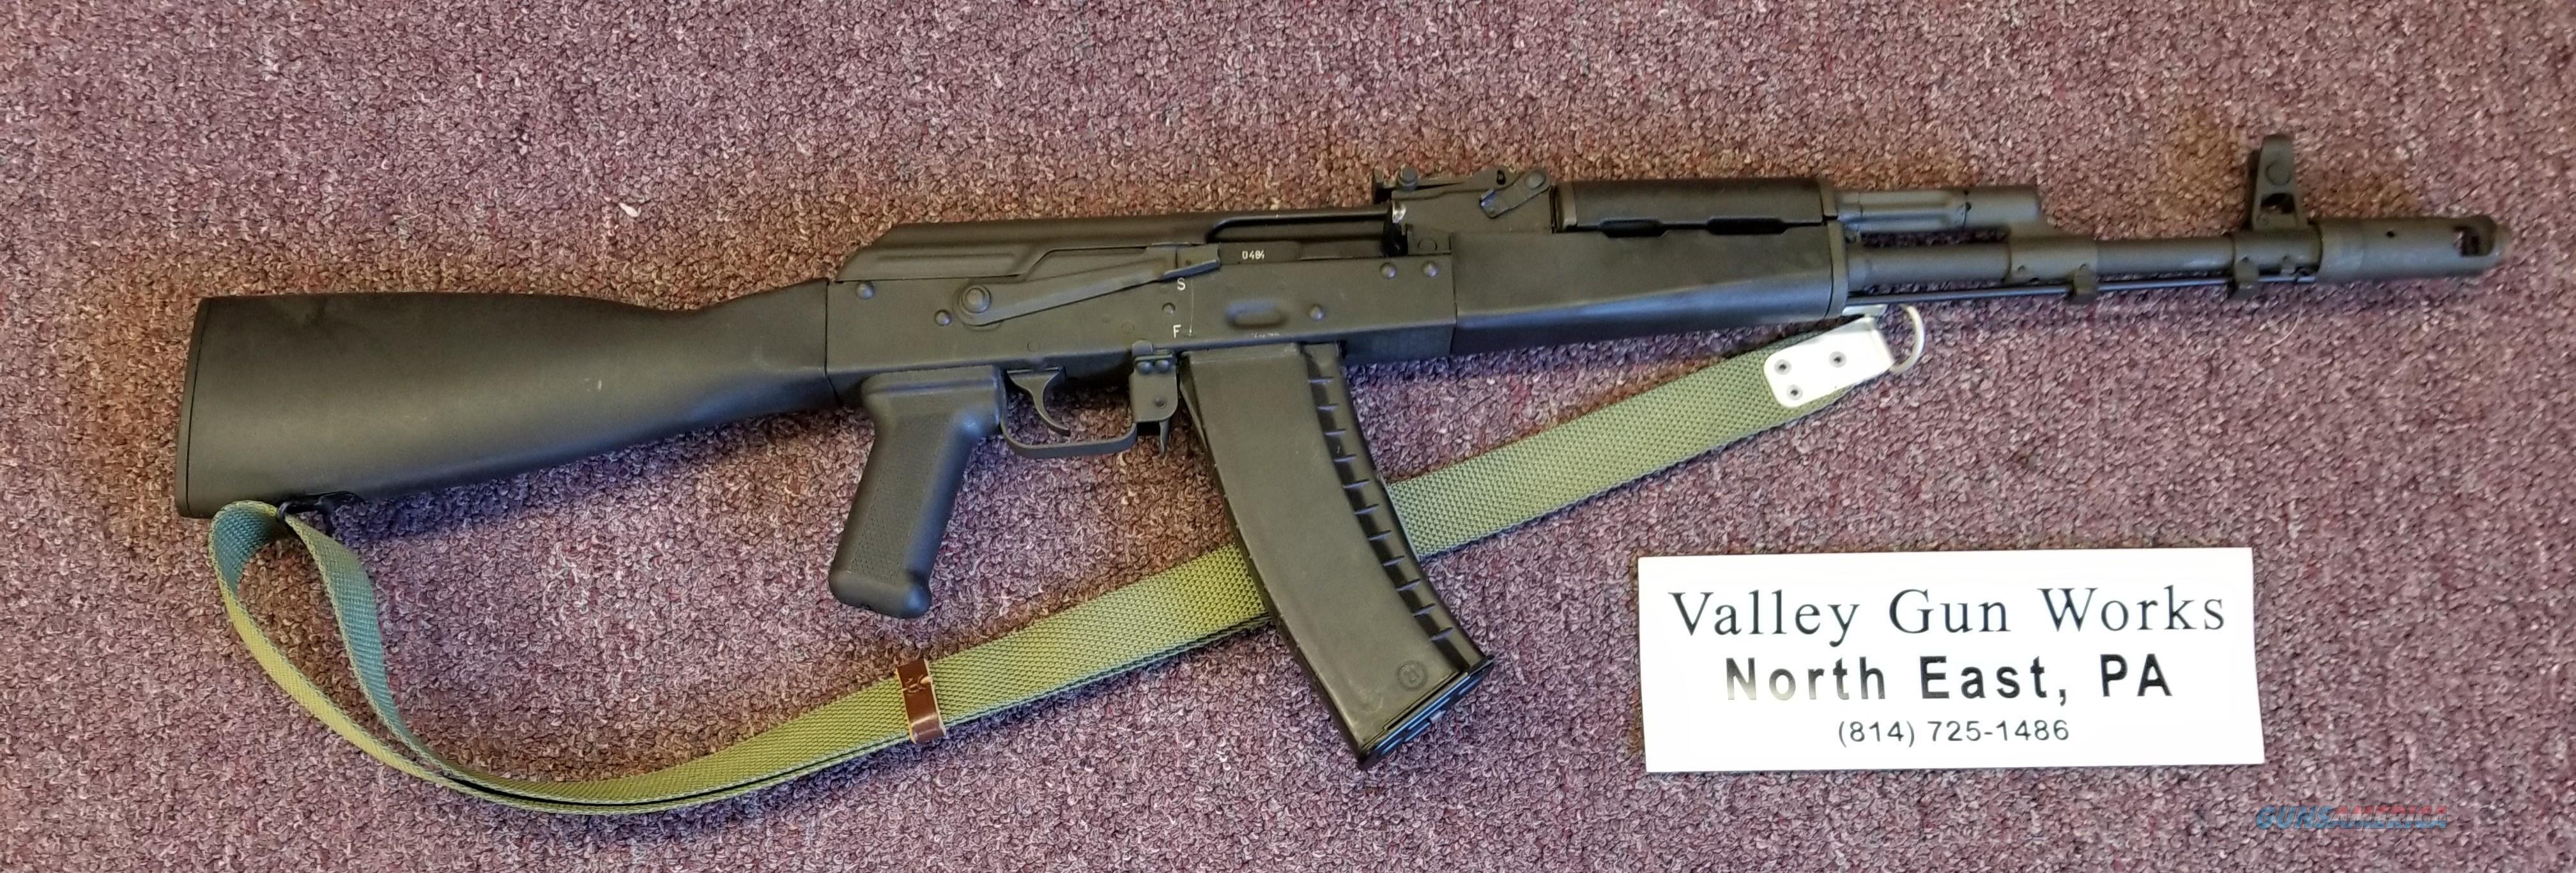 CAI  AK-74  5.45X39 - 3 Mags - Xtra New Barrel - Free Shipping  Guns > Rifles > Century International Arms - Rifles > Rifles